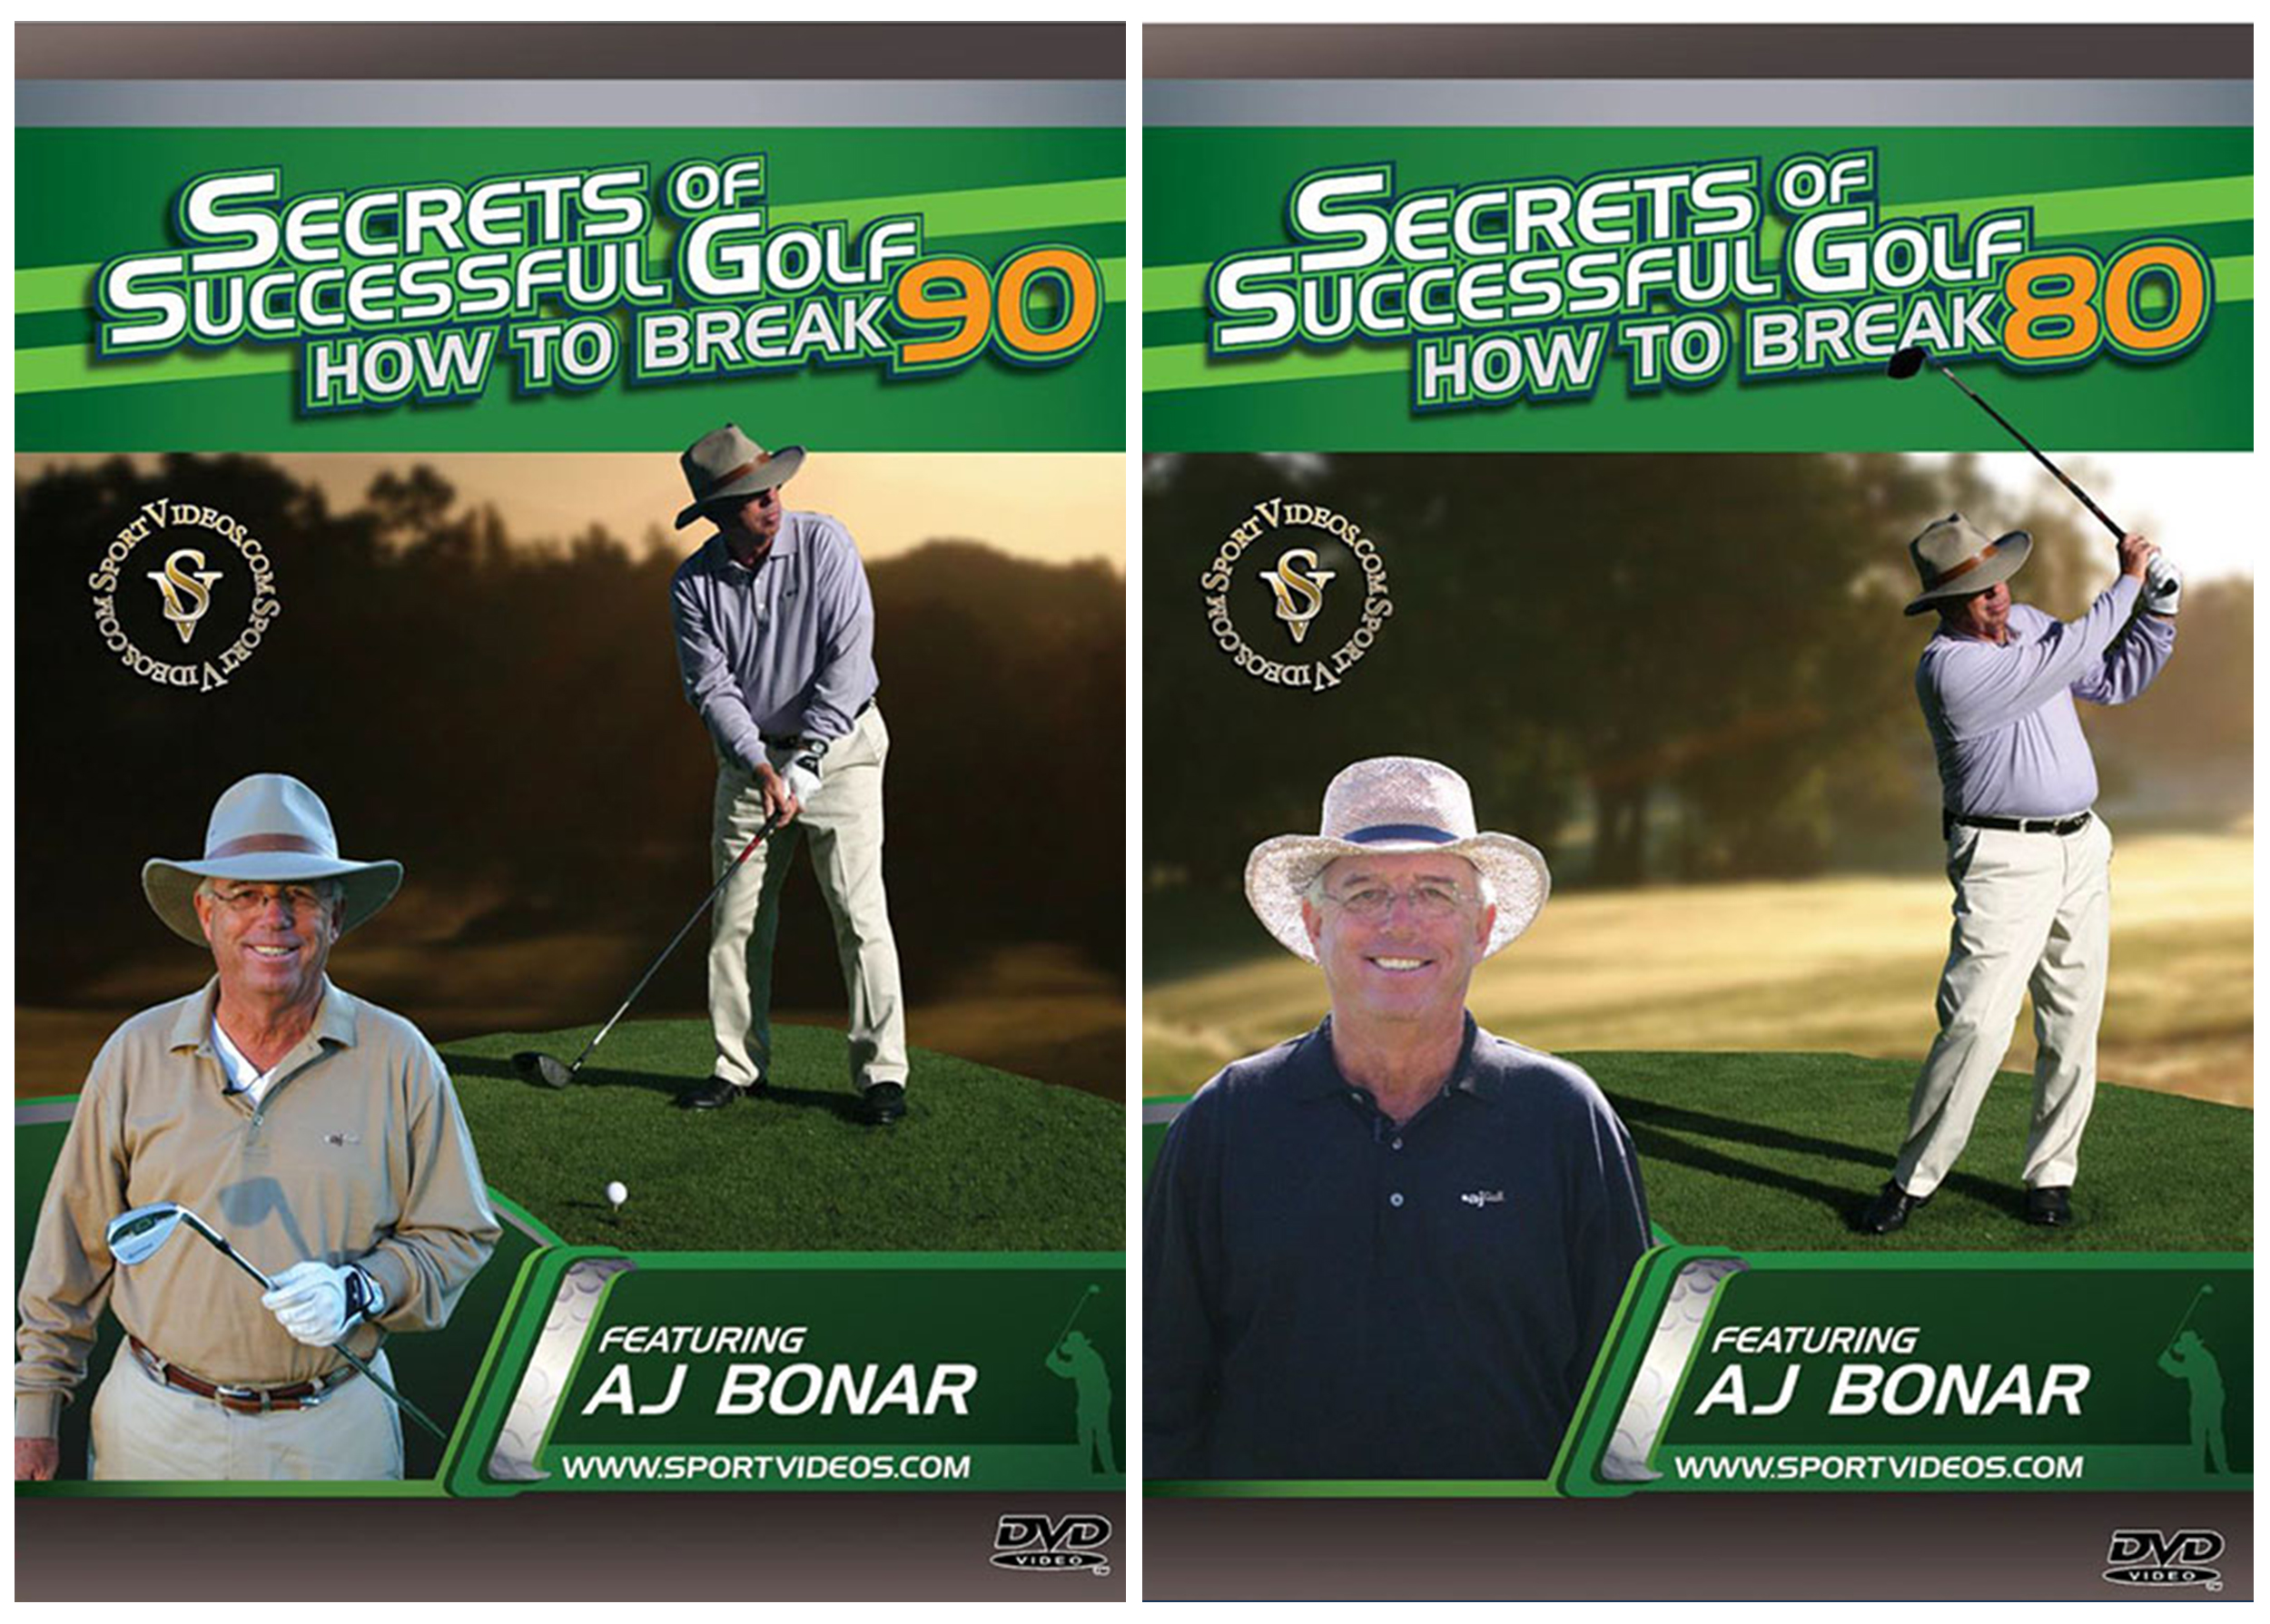 Secrets of Successful Golf 2 DVD Set